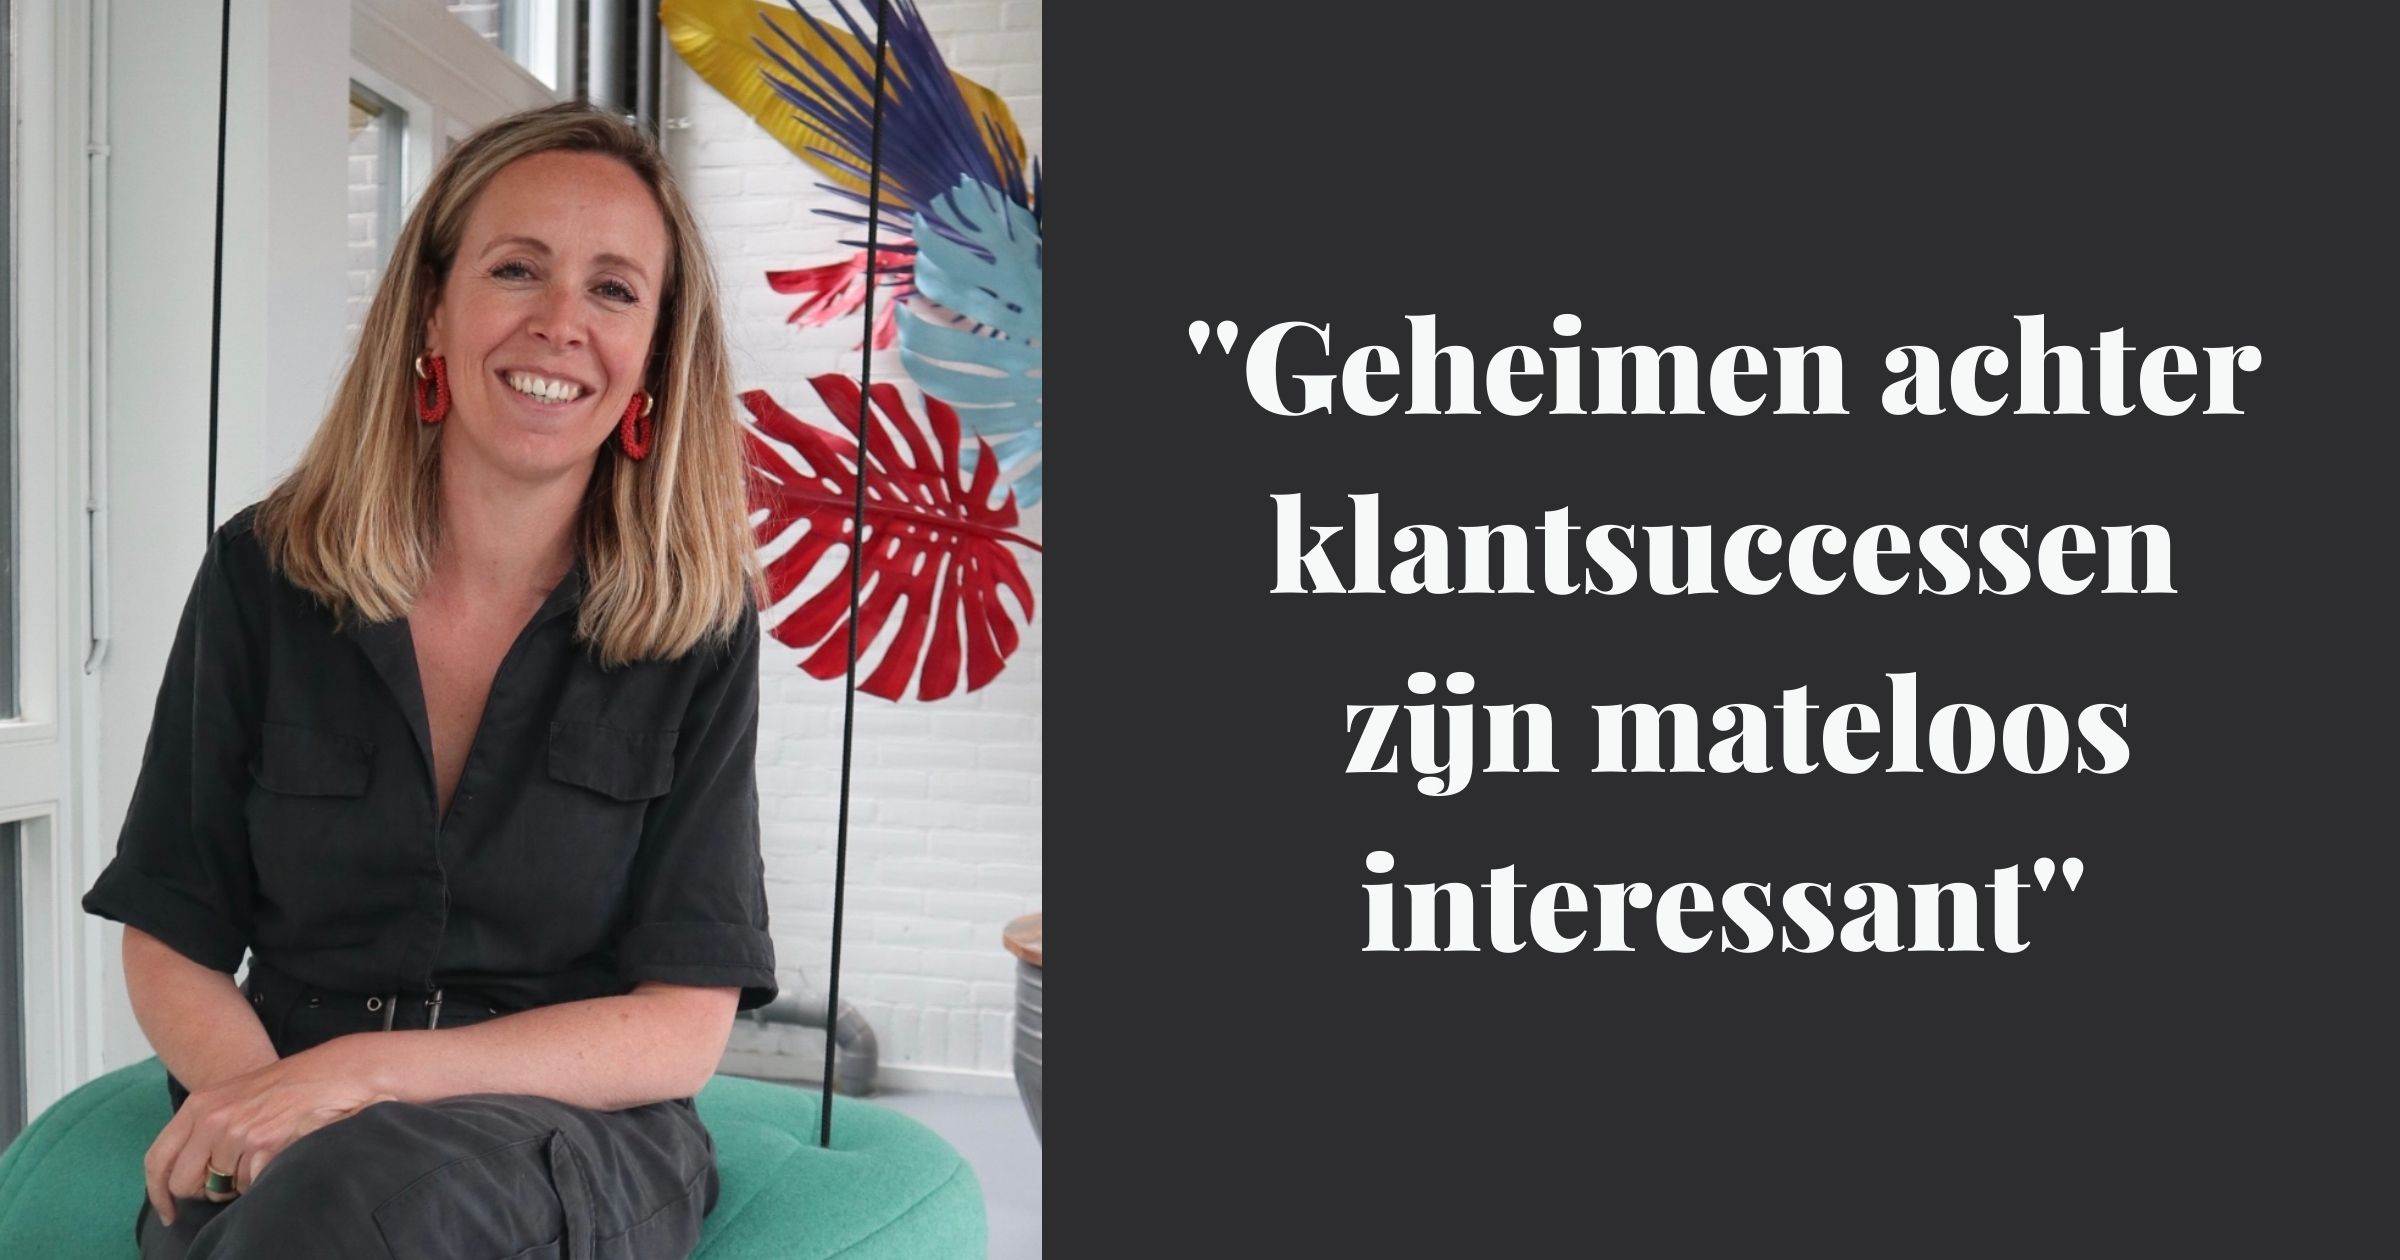 Anne-Marieke in het Emerce Magazine